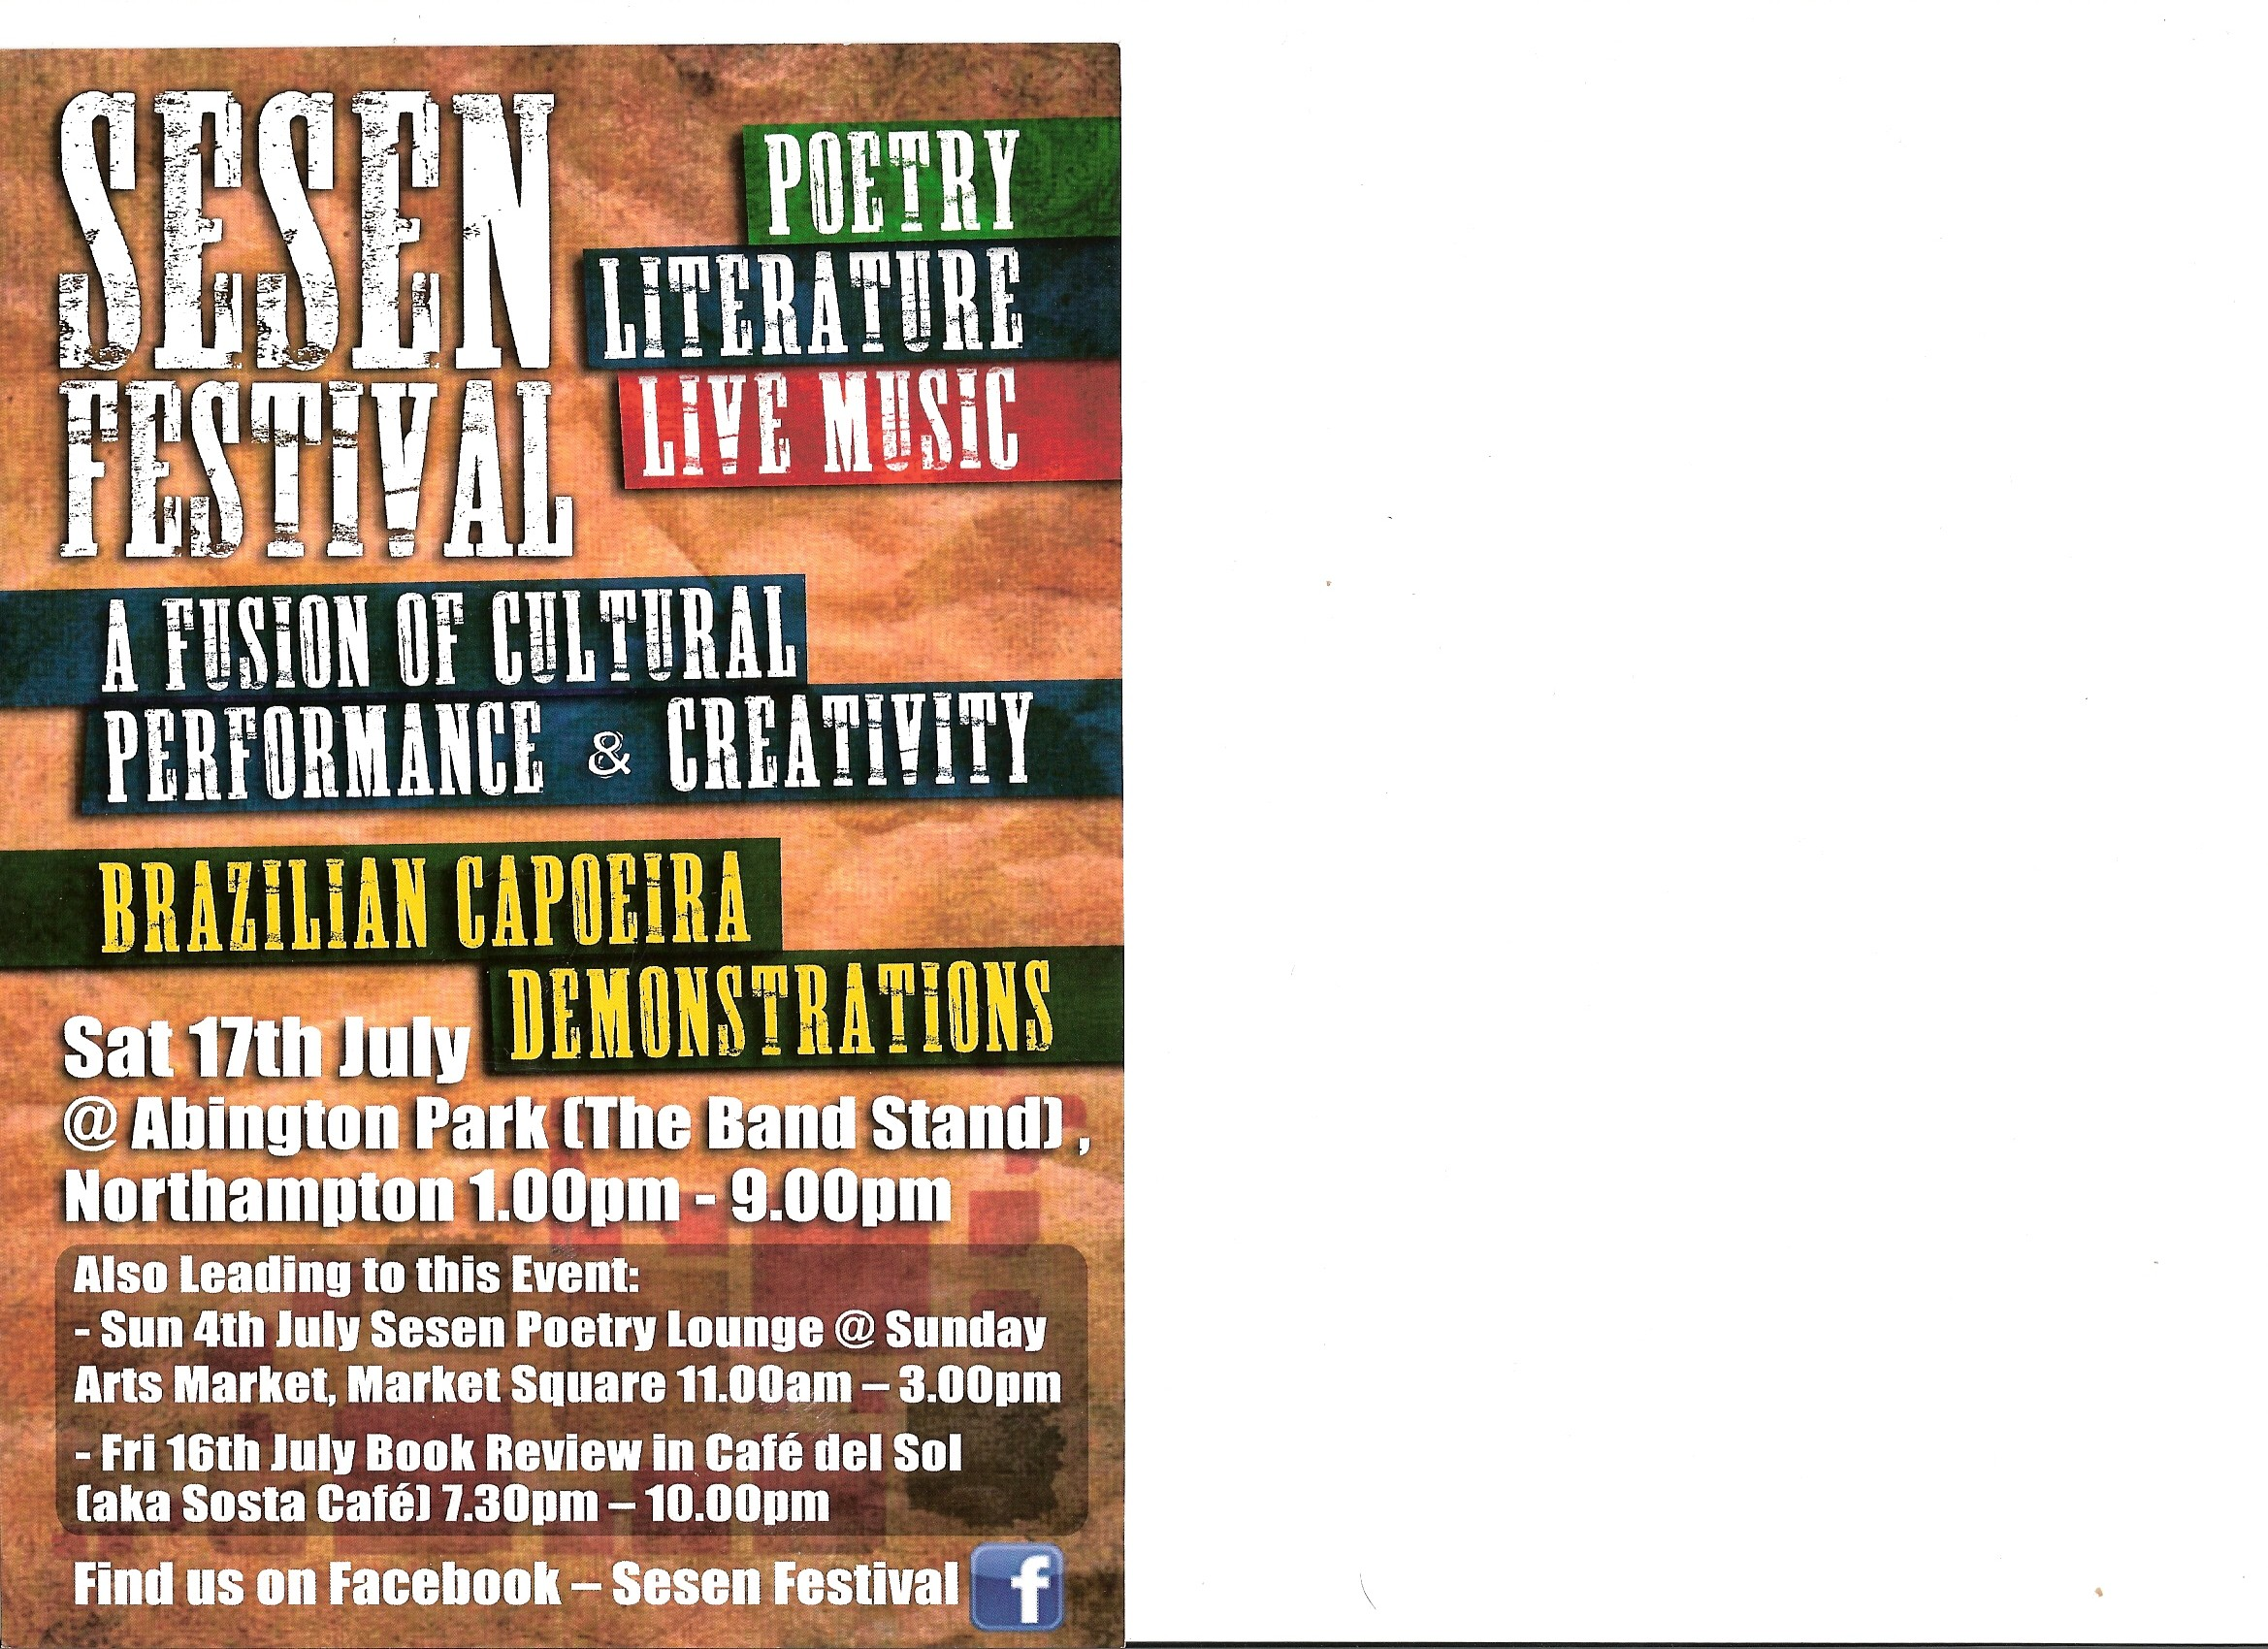 Poetry in Performance — Dzifa Benson